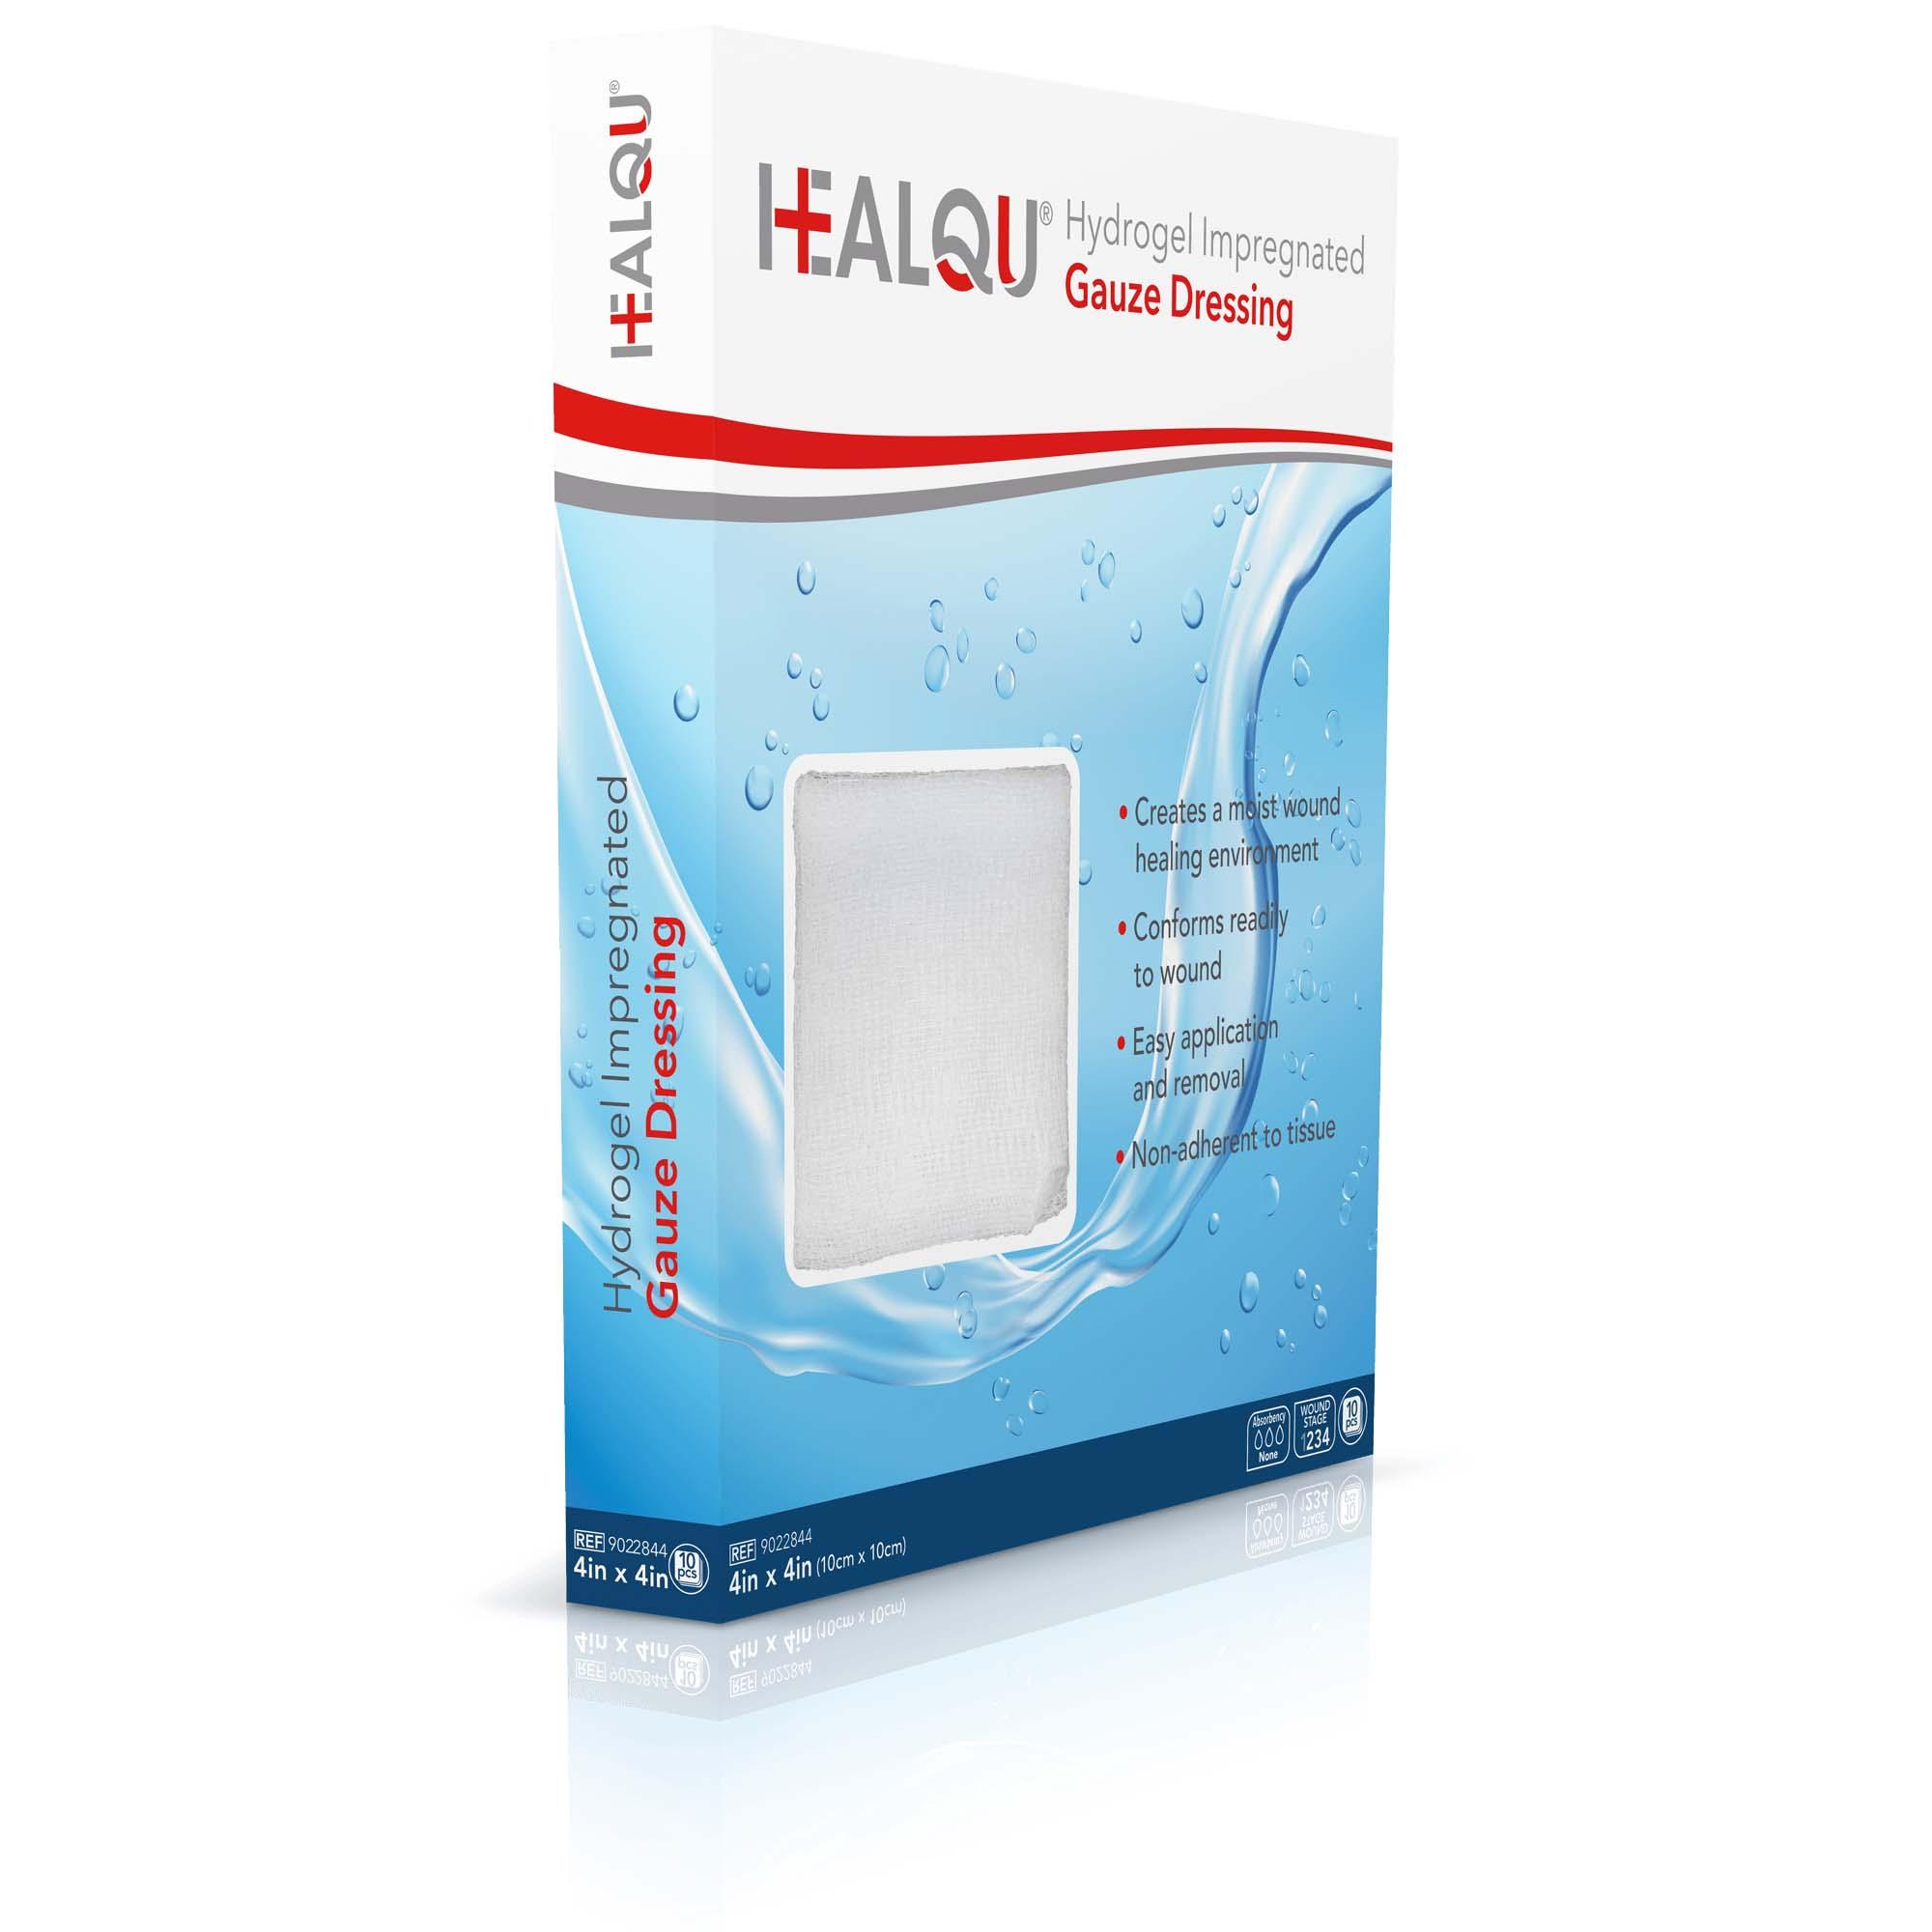 Image Of Healqu Hydrogel Impregnated Gauze Dressing 4in x 4in (10 x 10cm)